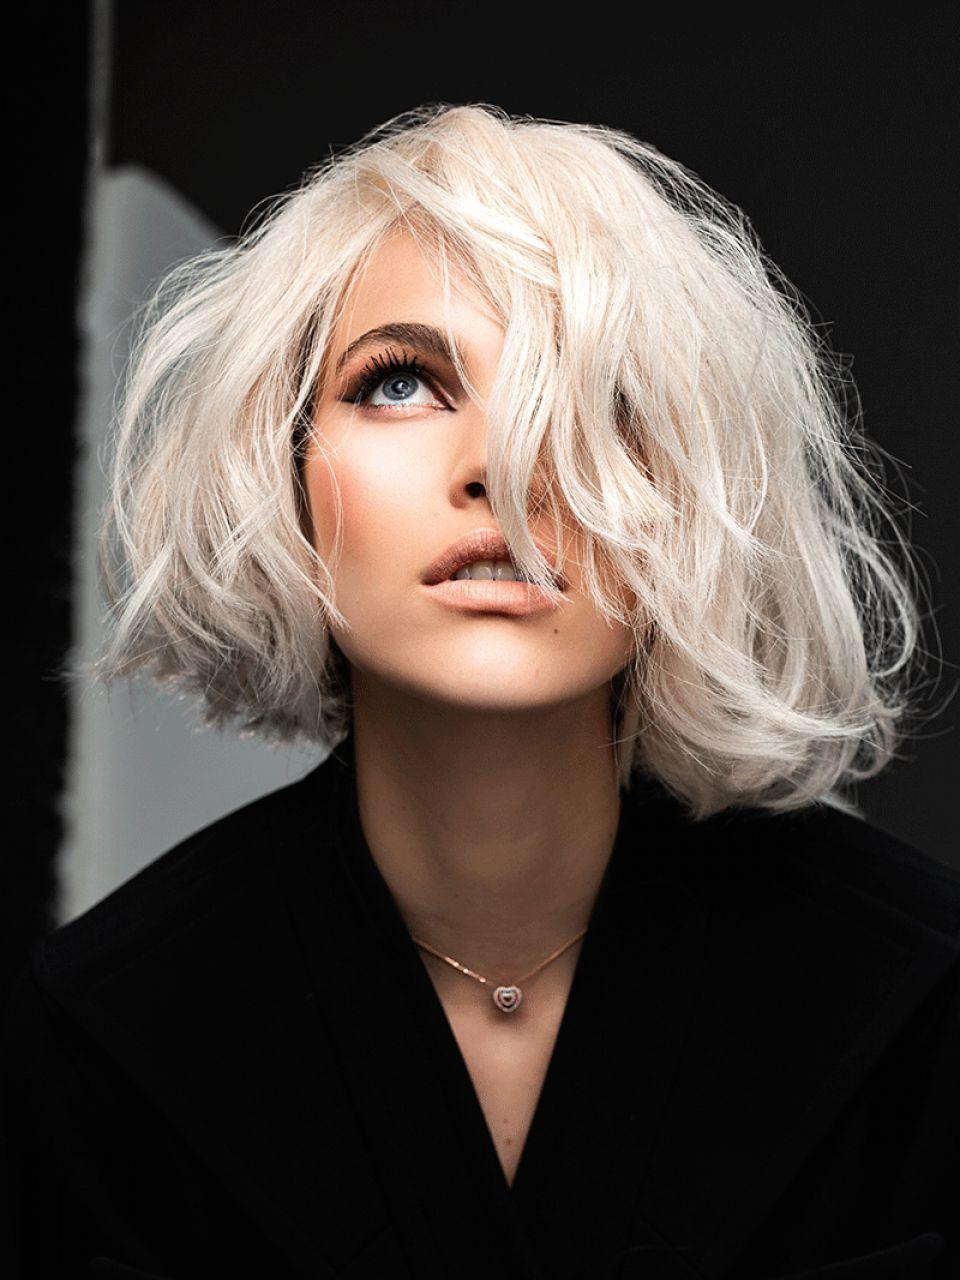 Mittellang ab 45 frisuren Frisuren Damen